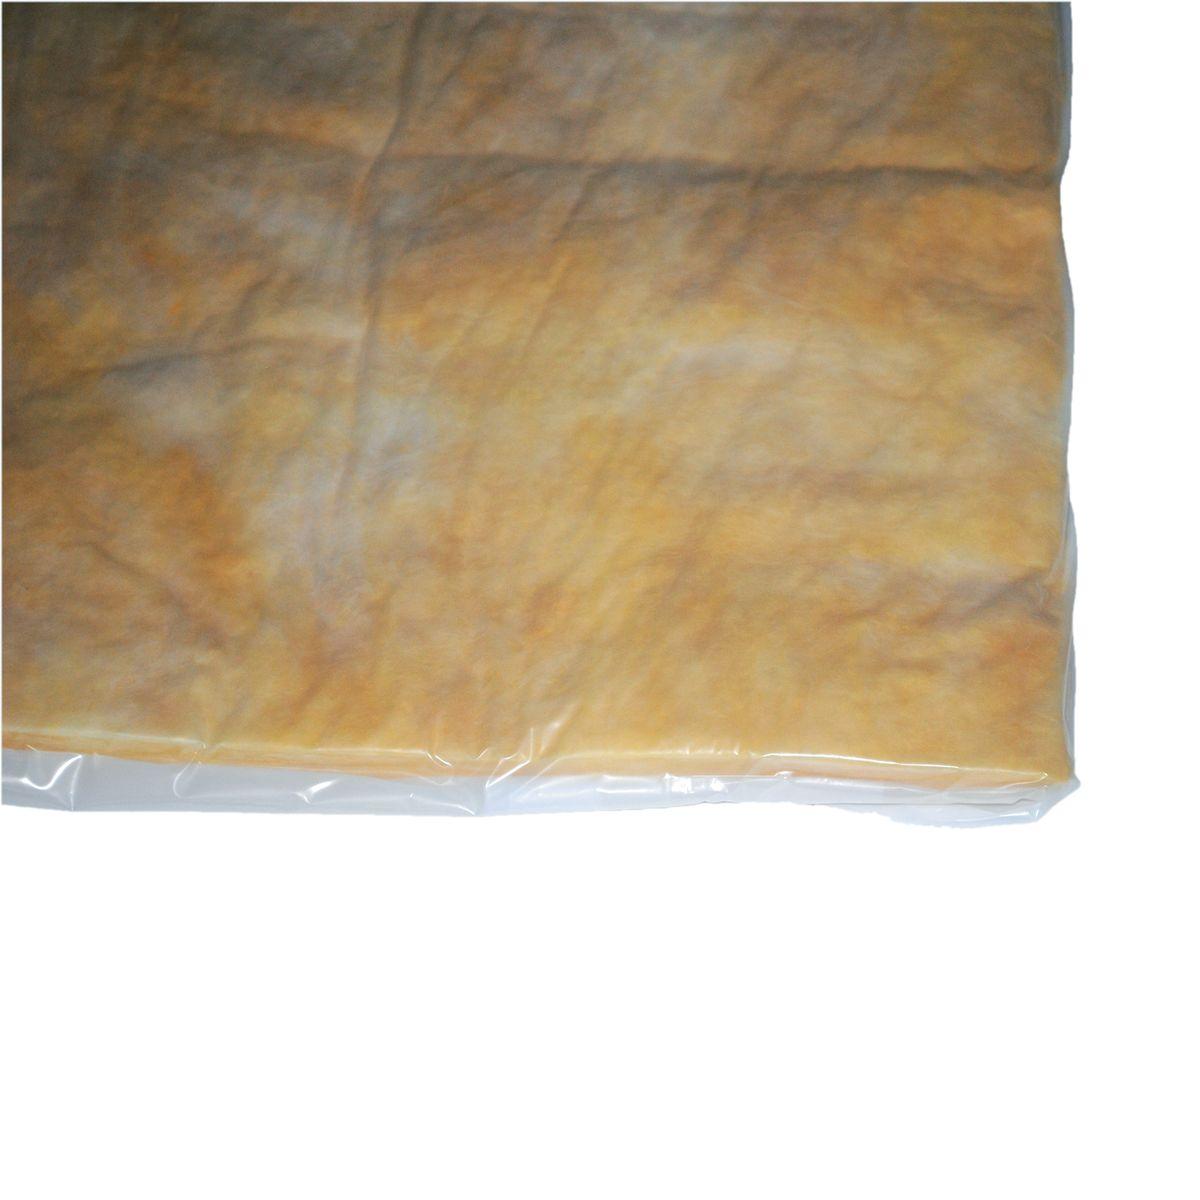 Pannelli isolanti leroy merlin glitter pareti tiarch com for Pittura lavabile prezzi leroy merlin